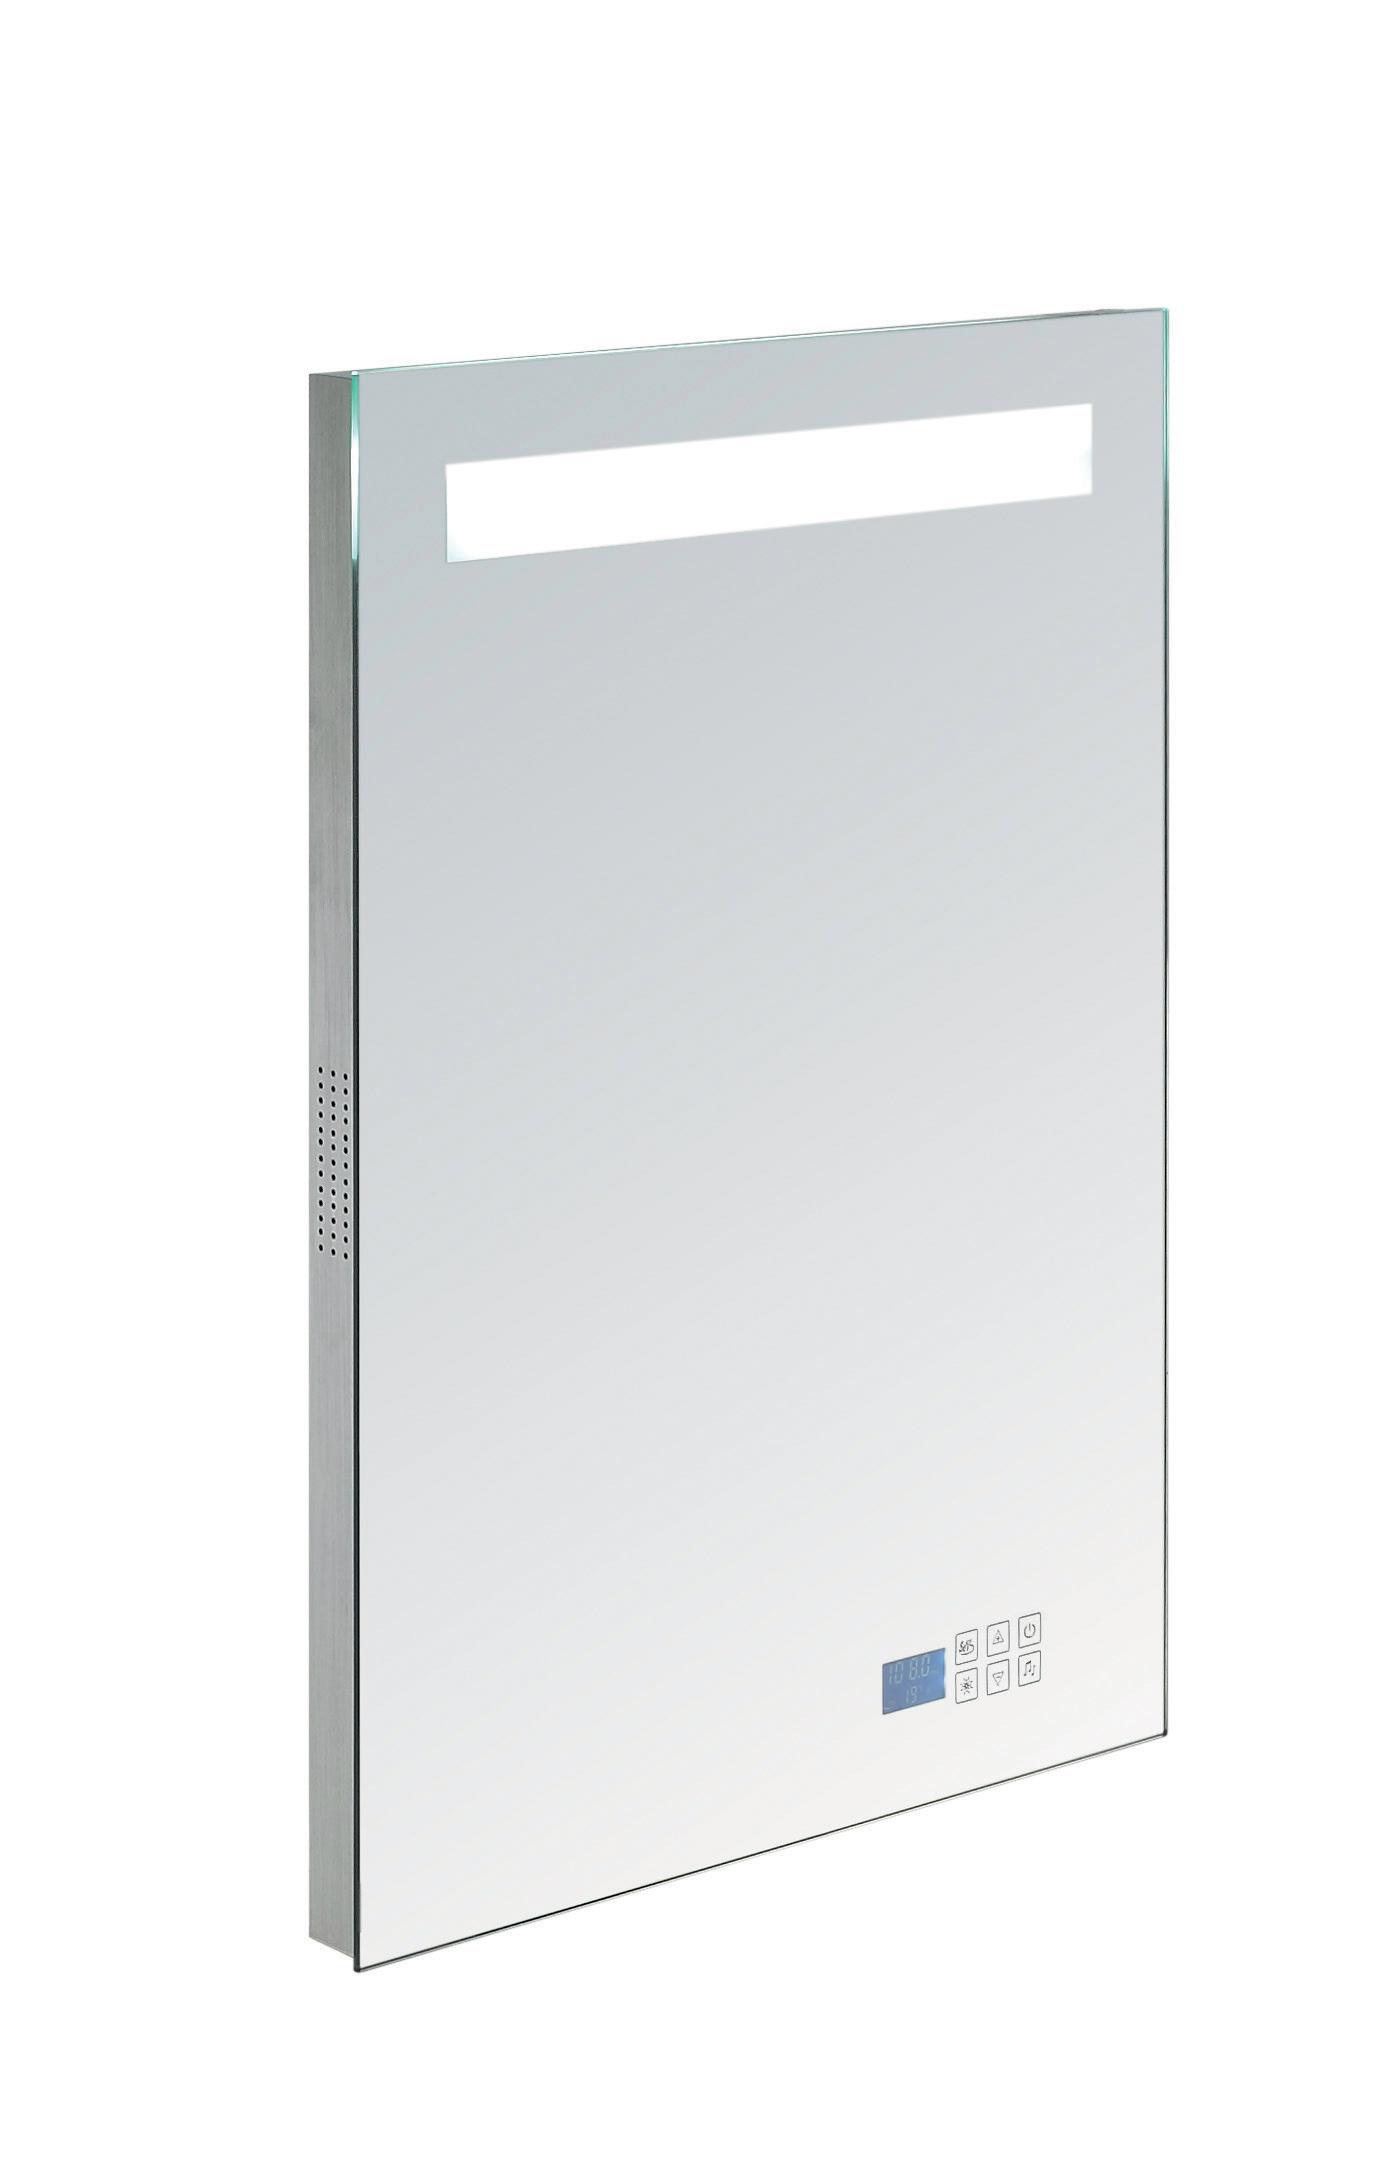 Badkamer spiegel met Bluetooth, verlichting en radio | Douchecabine.nl